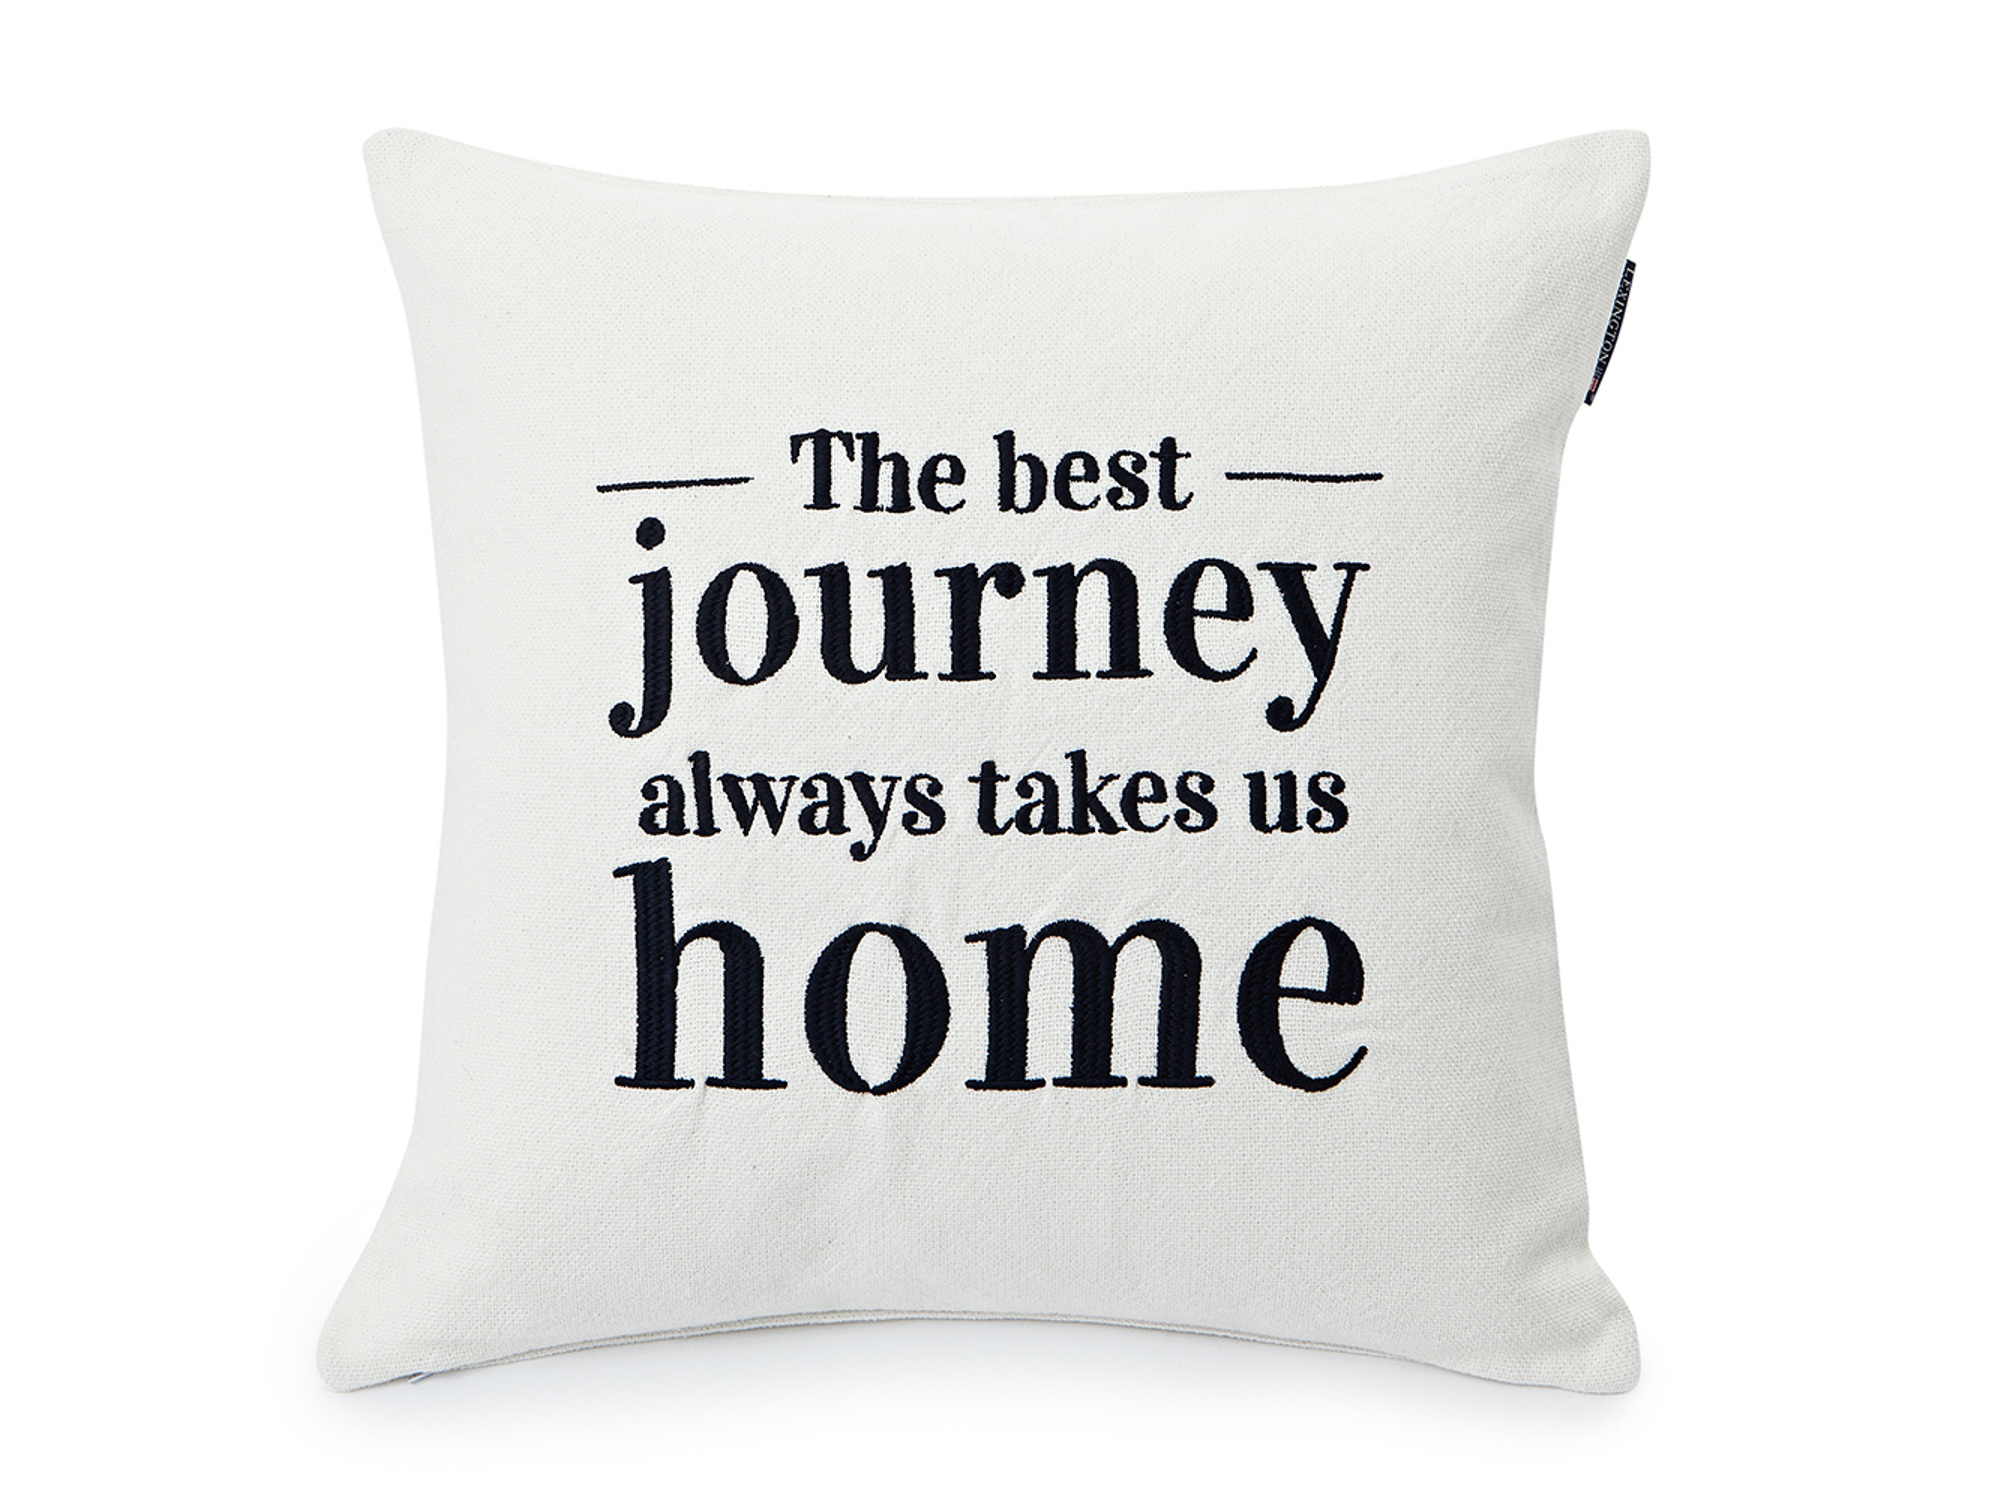 Embroidery Home Sham, White